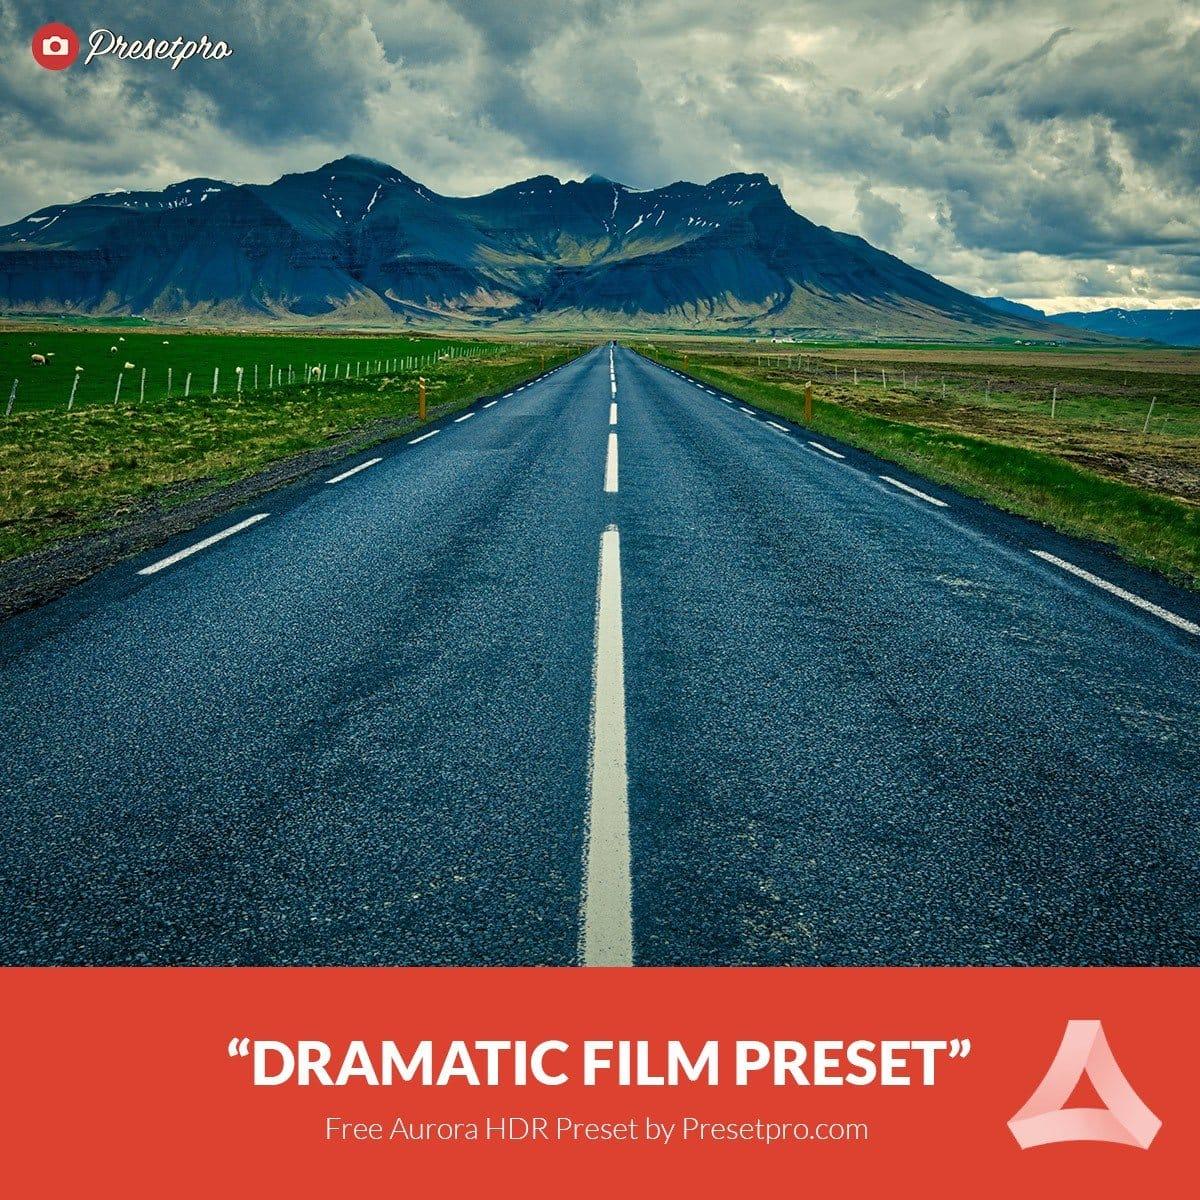 Free-Aurora-HDR-Preset-Dramatic-Film-Presetpro.com